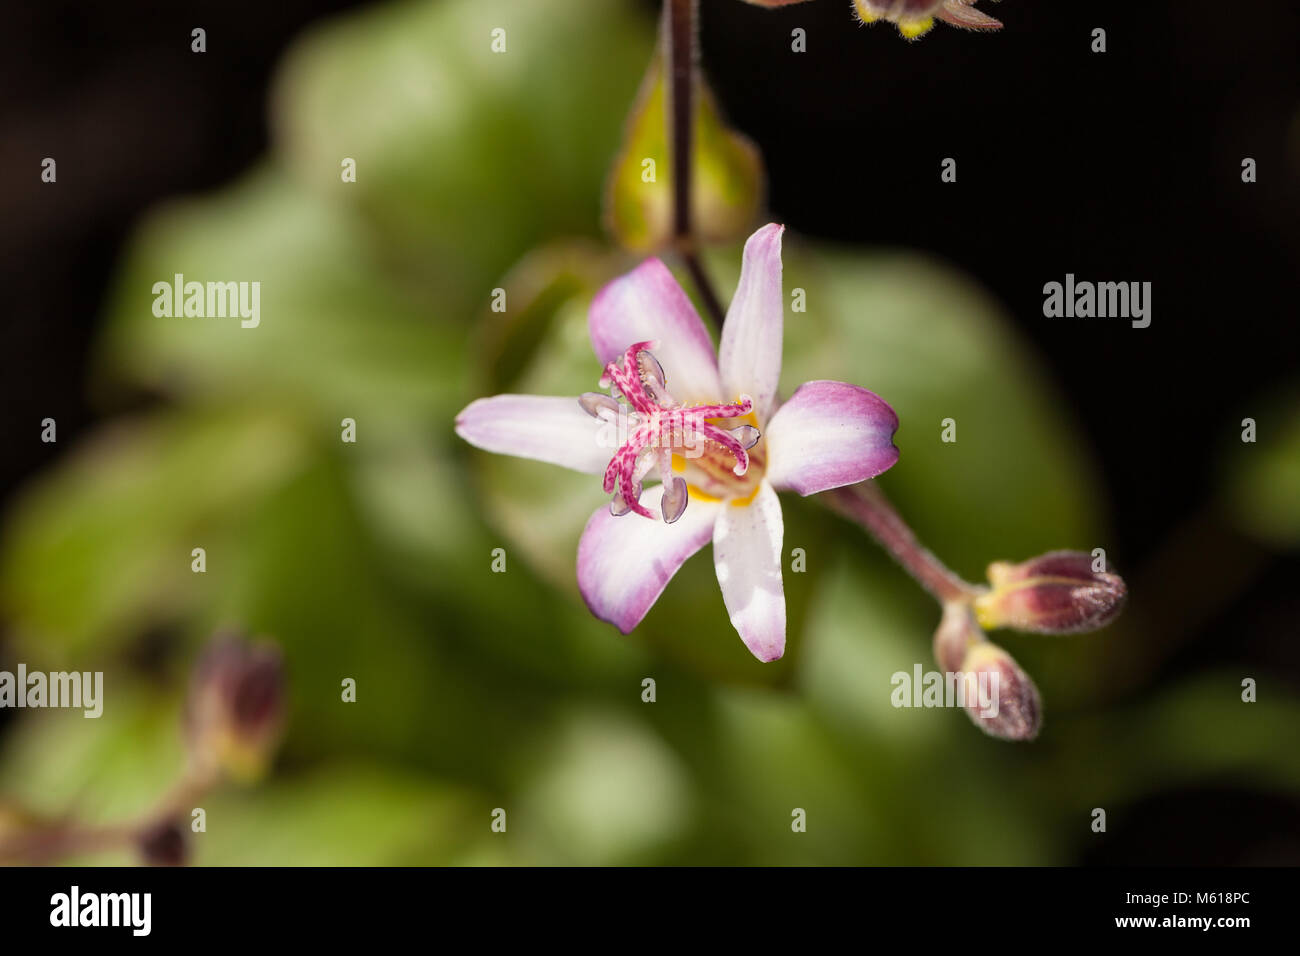 'Tojen' Japanese orchid lily, Hårig skugglilja (Tricyrtis hirta) Stock Photo